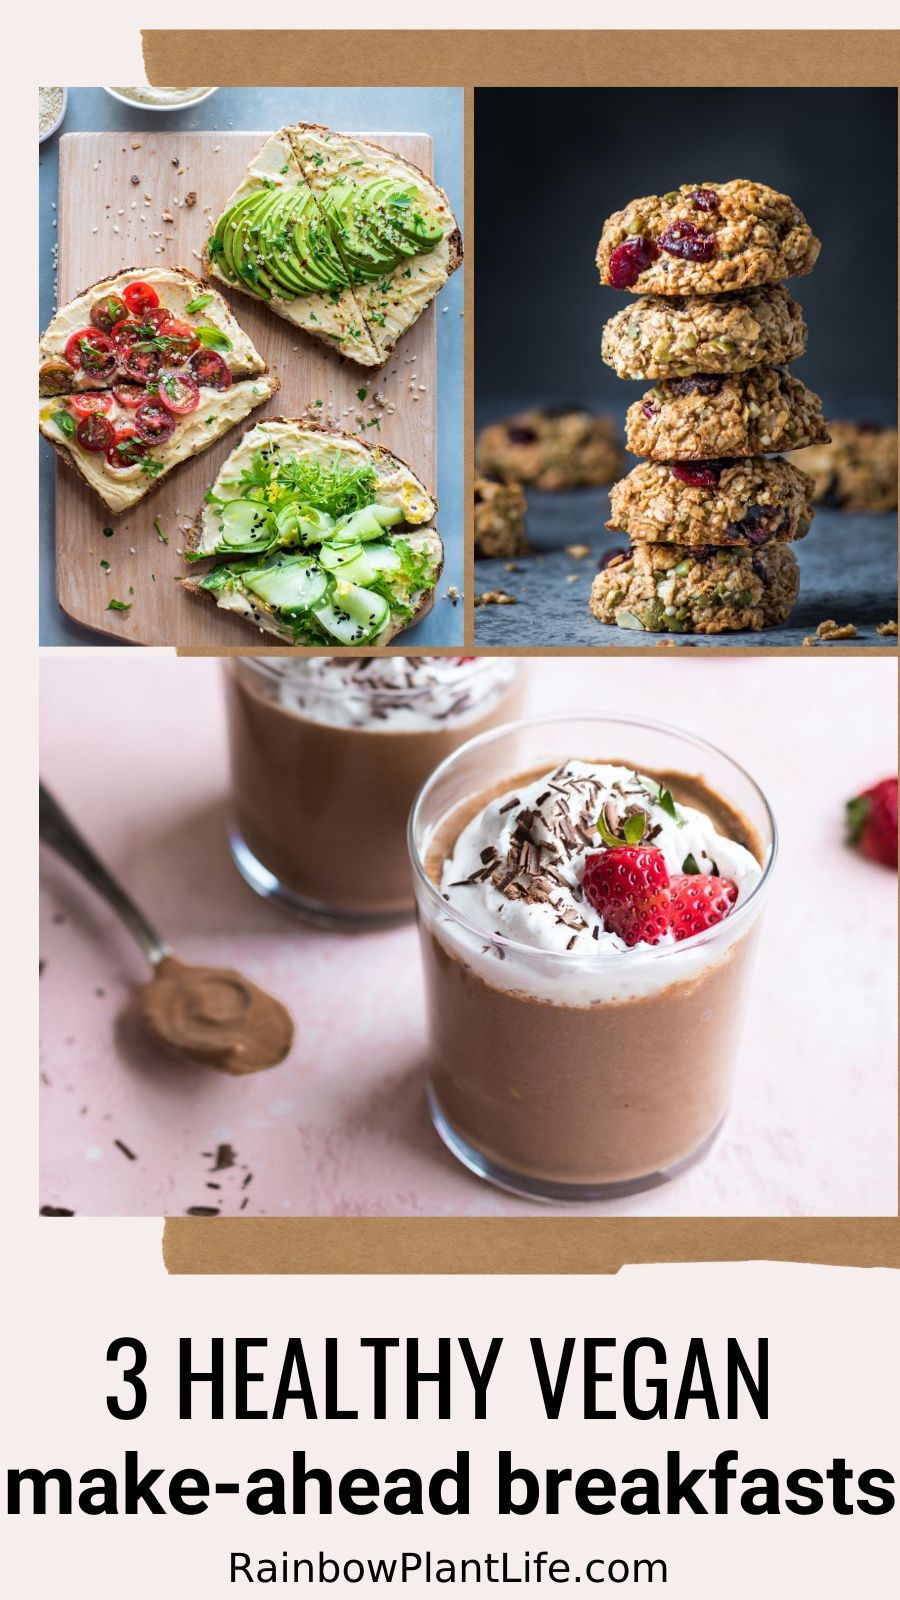 Make Ahead Breakfasts Vegan Gluten Free Oil Free Rainbow Plant Life In 2020 Vegan Breakfast Easy Make Ahead Breakfast Vegan Breakfast Recipes